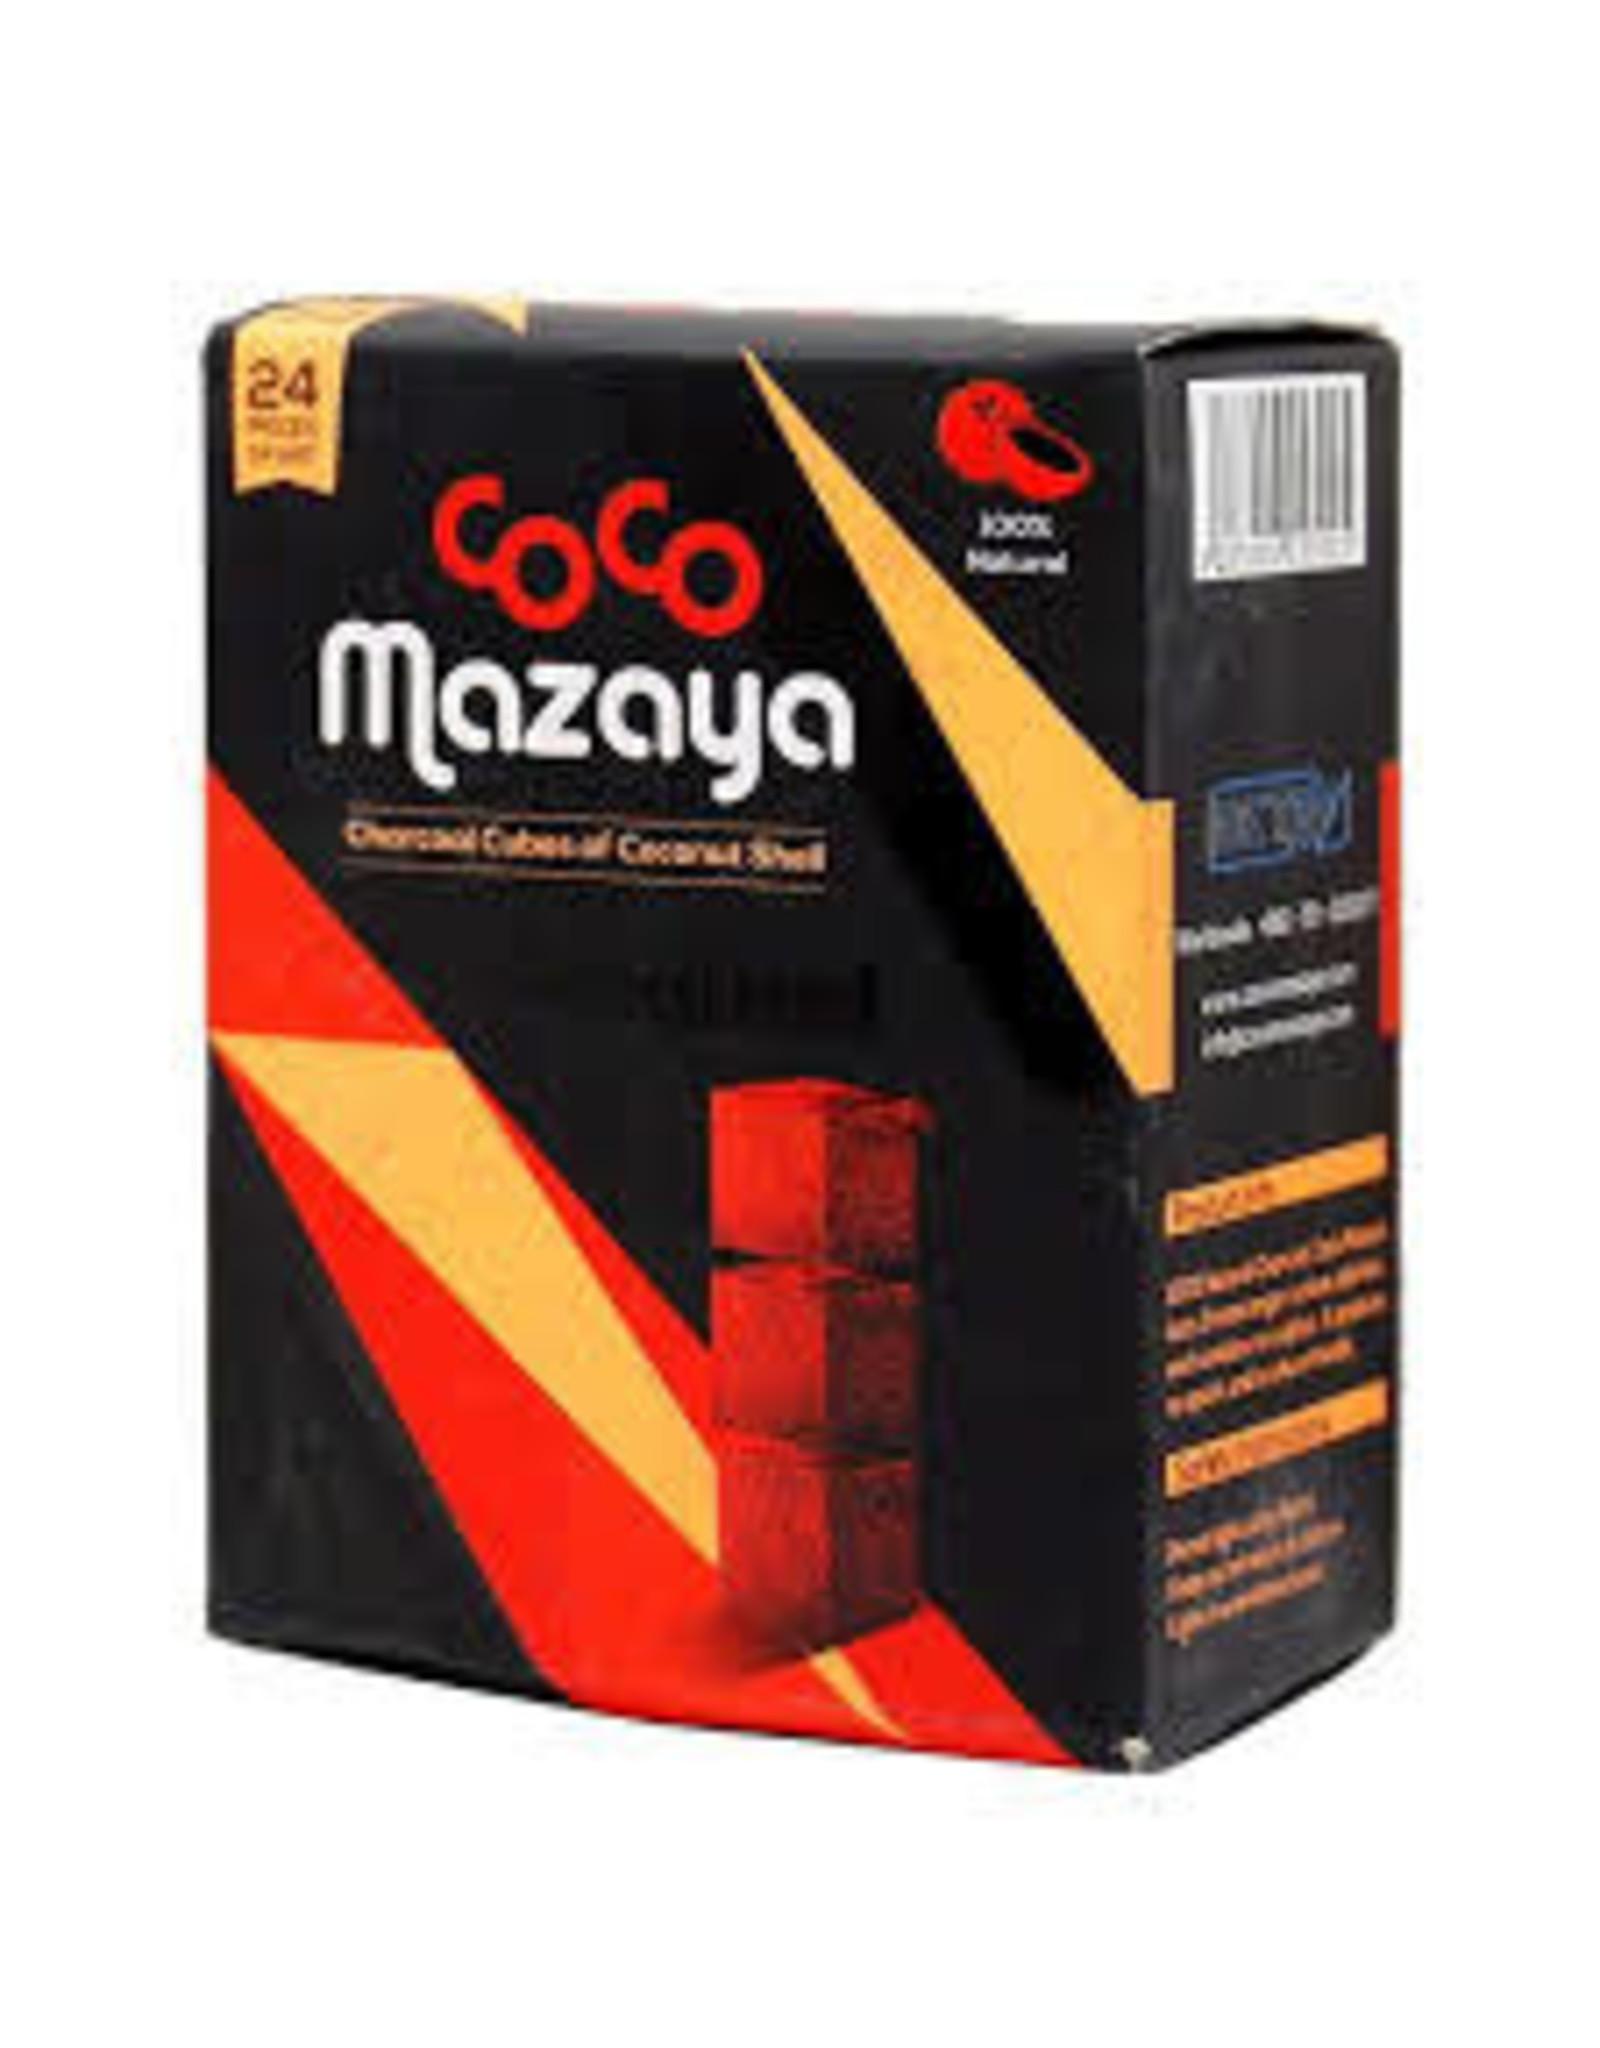 MAZAYA CHARCOAL COCO MAZAYA ORIGINAL